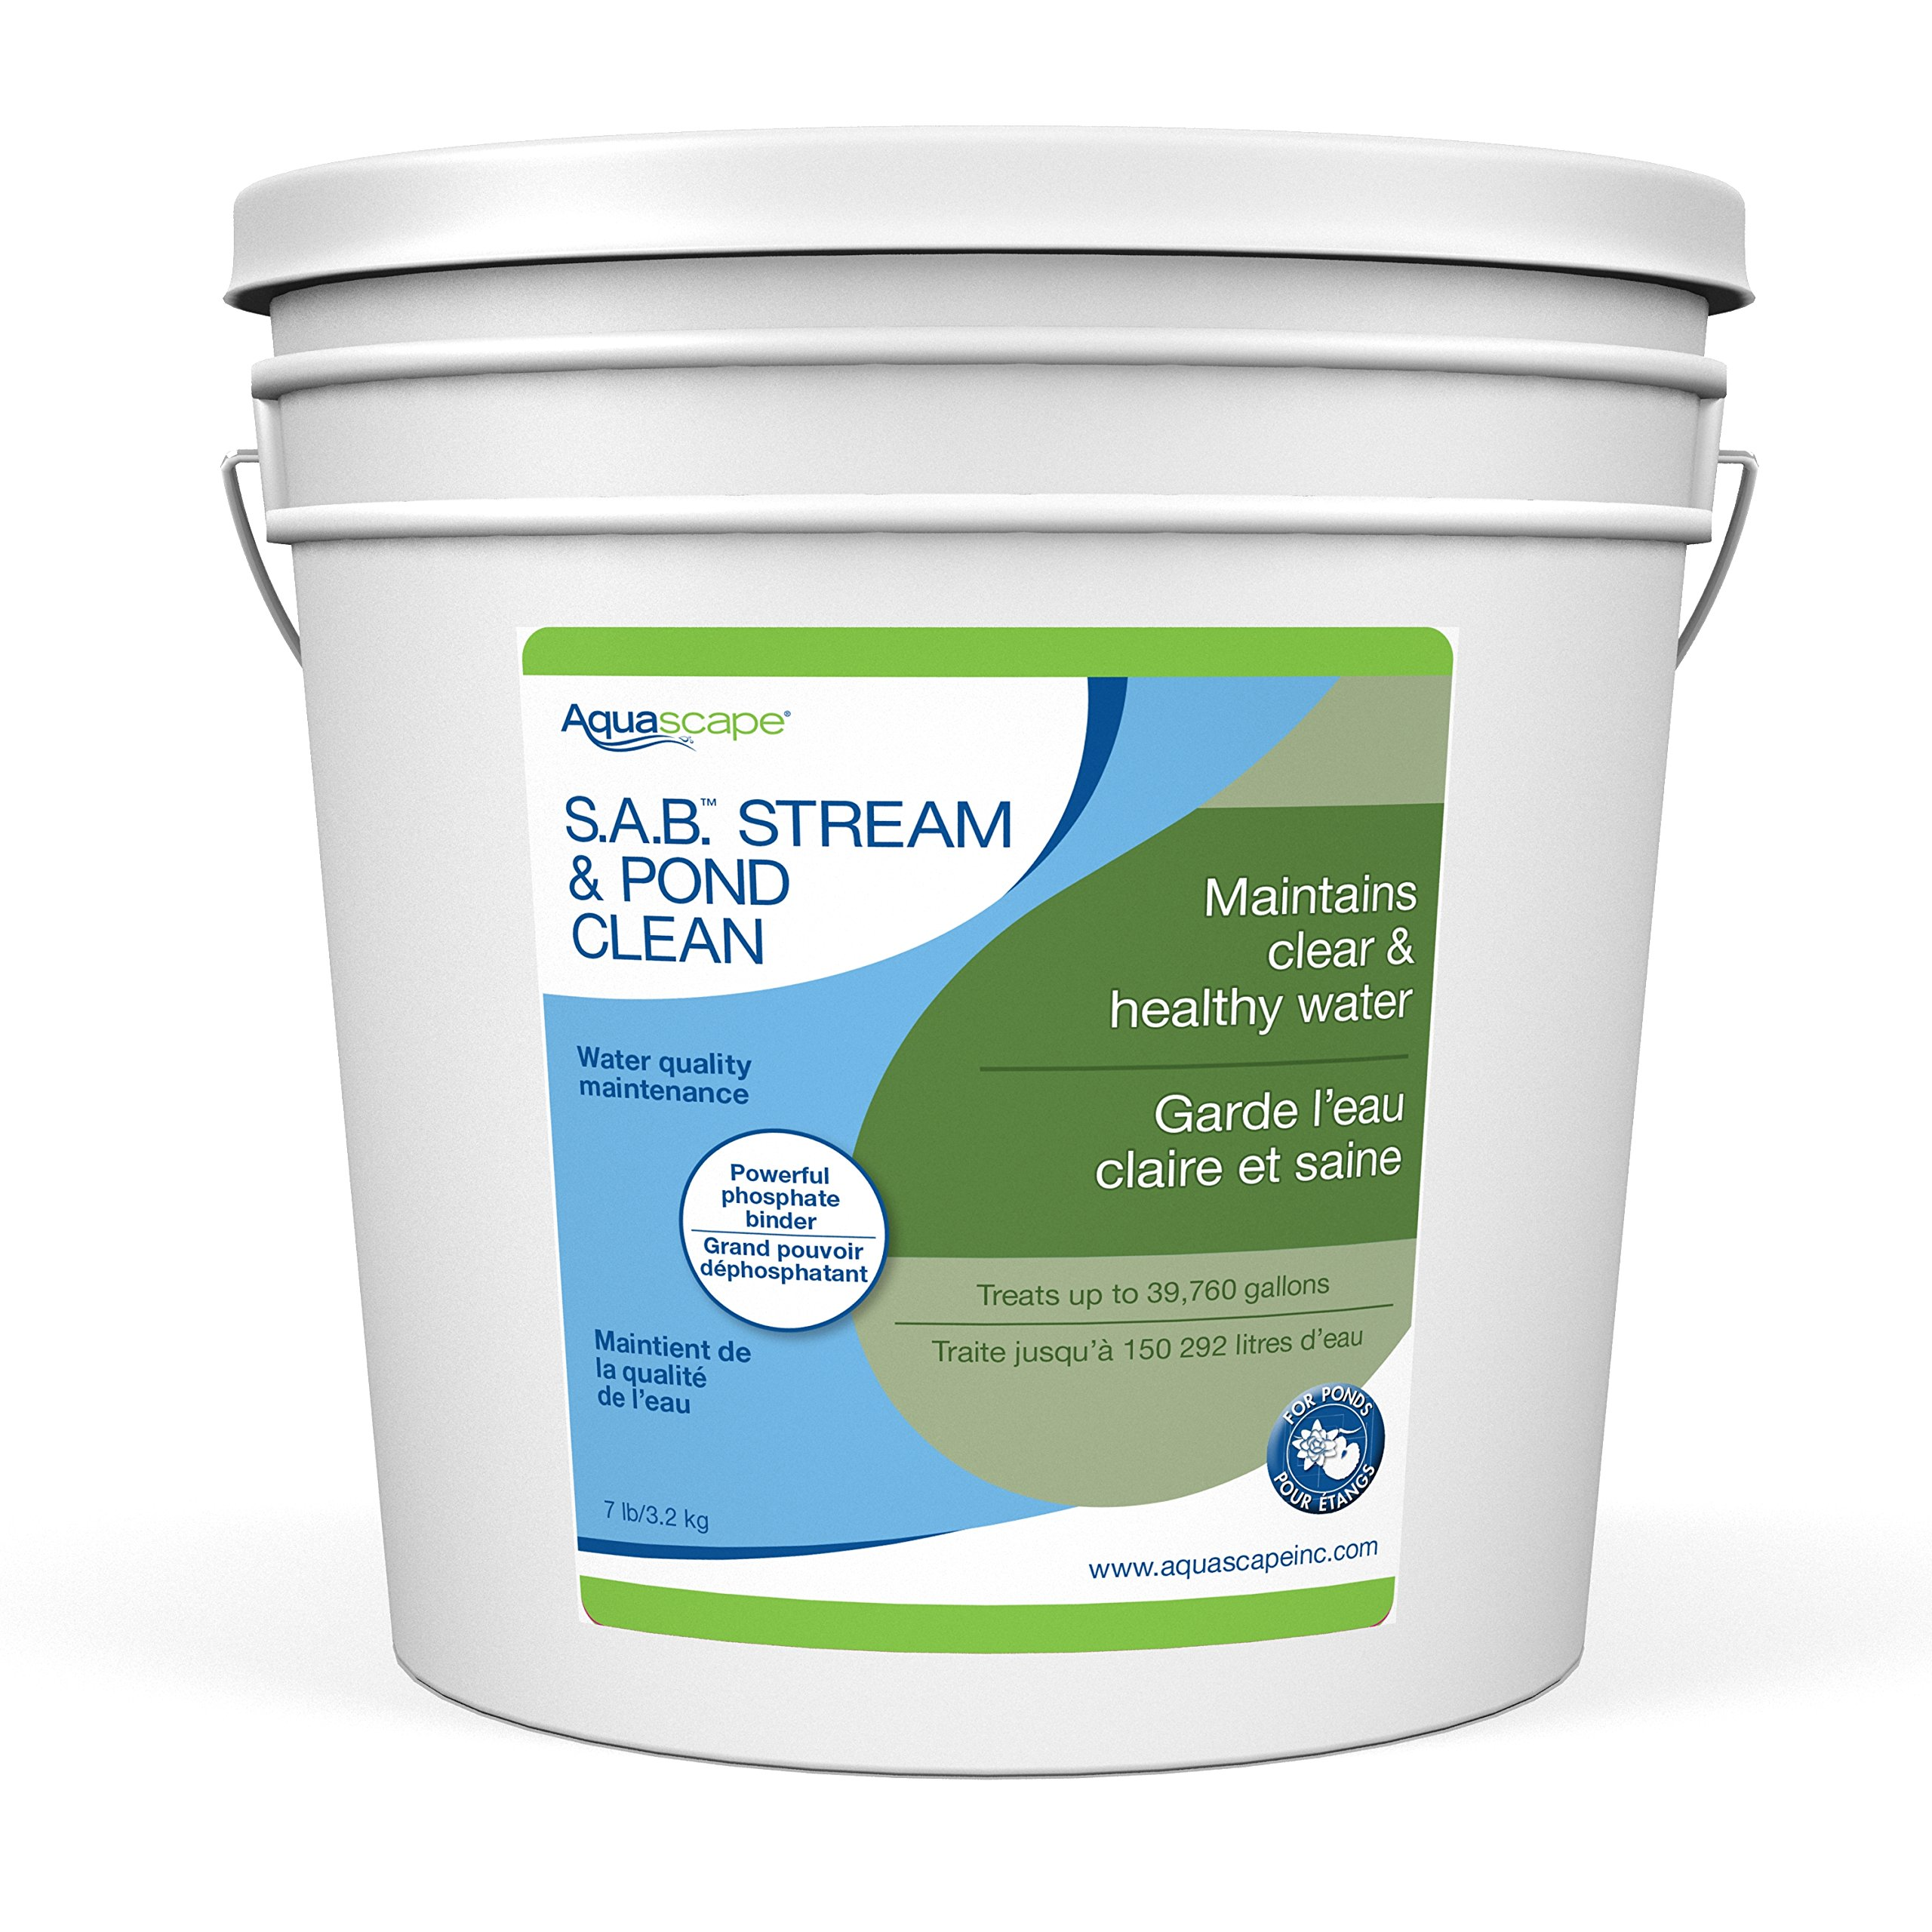 Aquascape 98896 SAB Stream & Pond Clean Water Treatment, 7-Pound by Aquascape